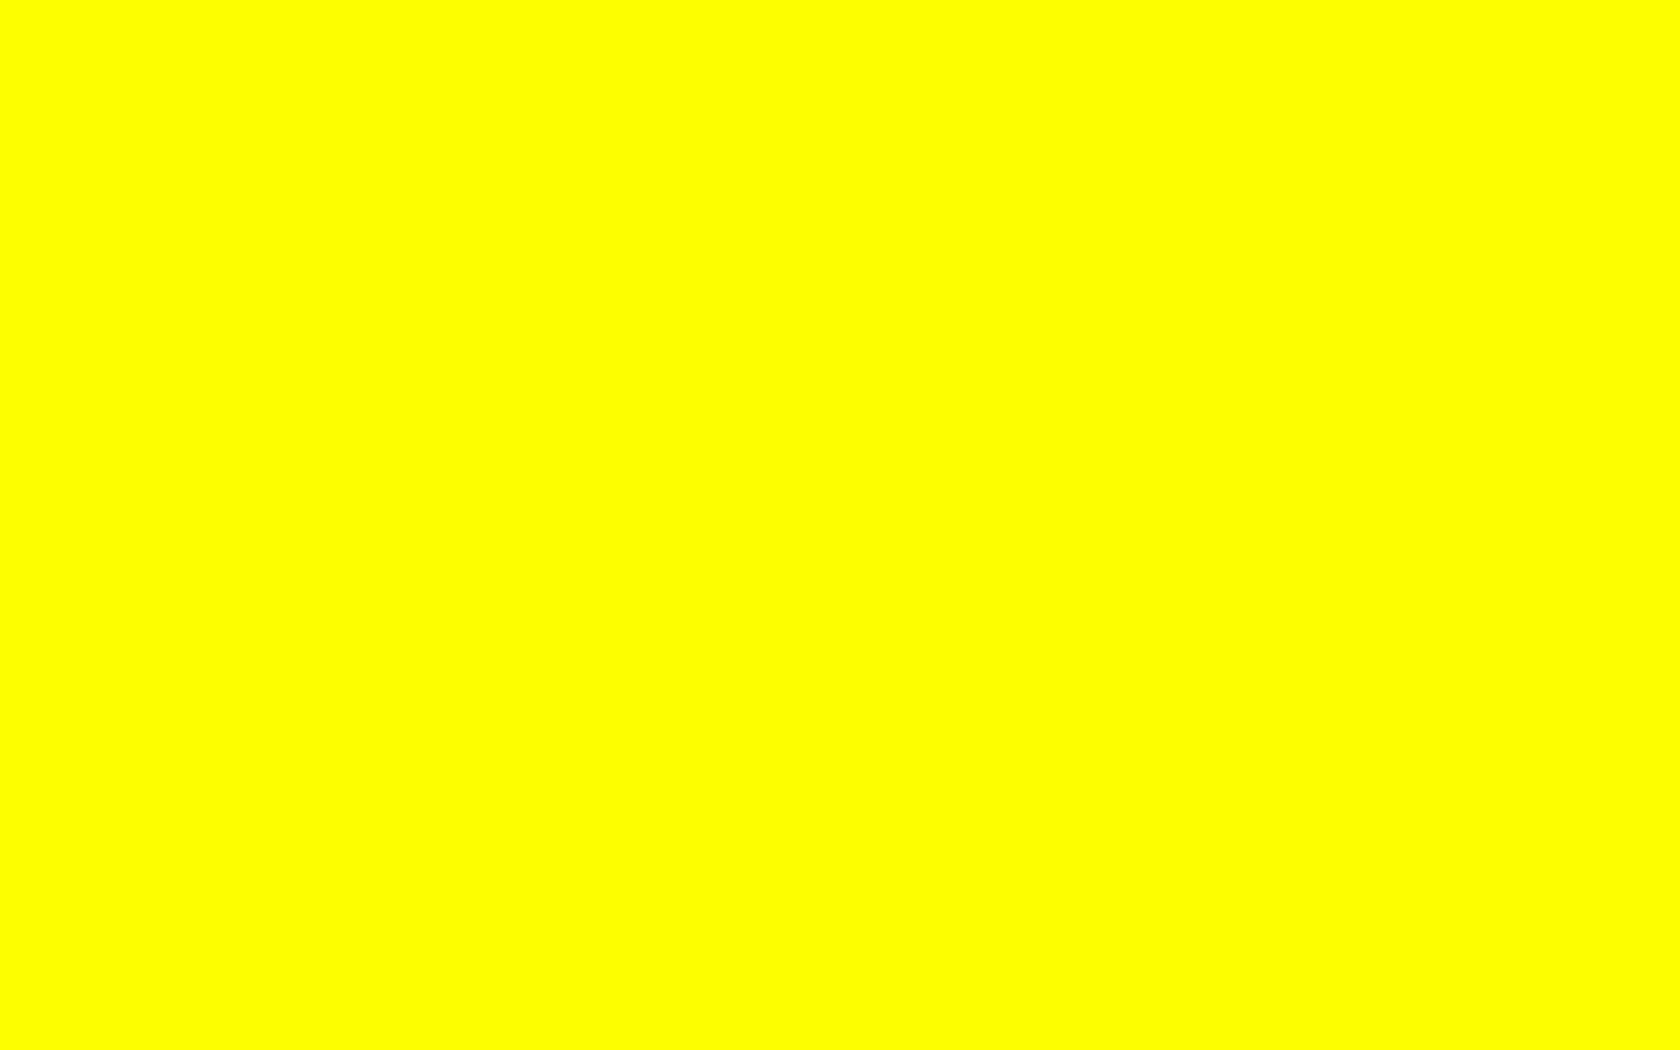 1680x1050 Lemon Glacier Solid Color Background